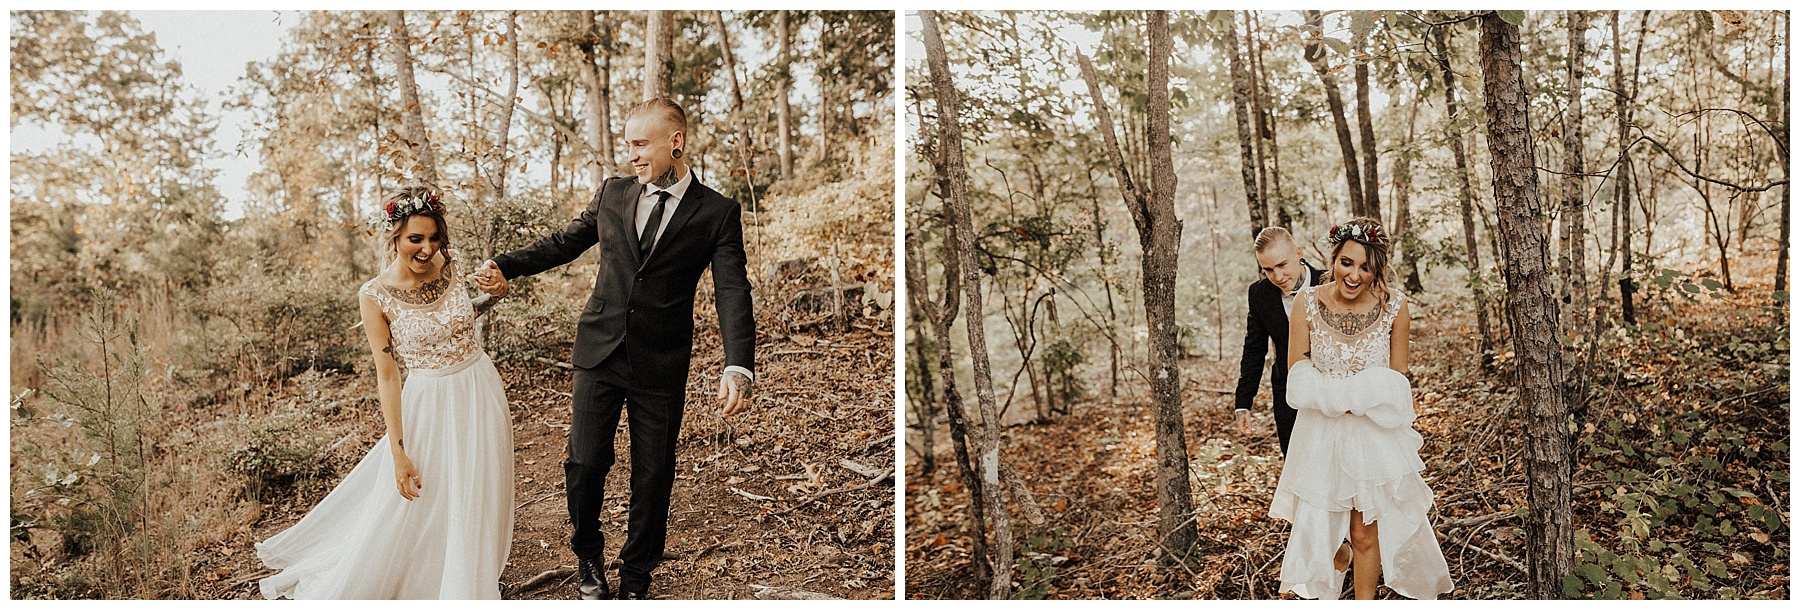 Georgia Wedding Tampa Wedding Photographer-105.jpg